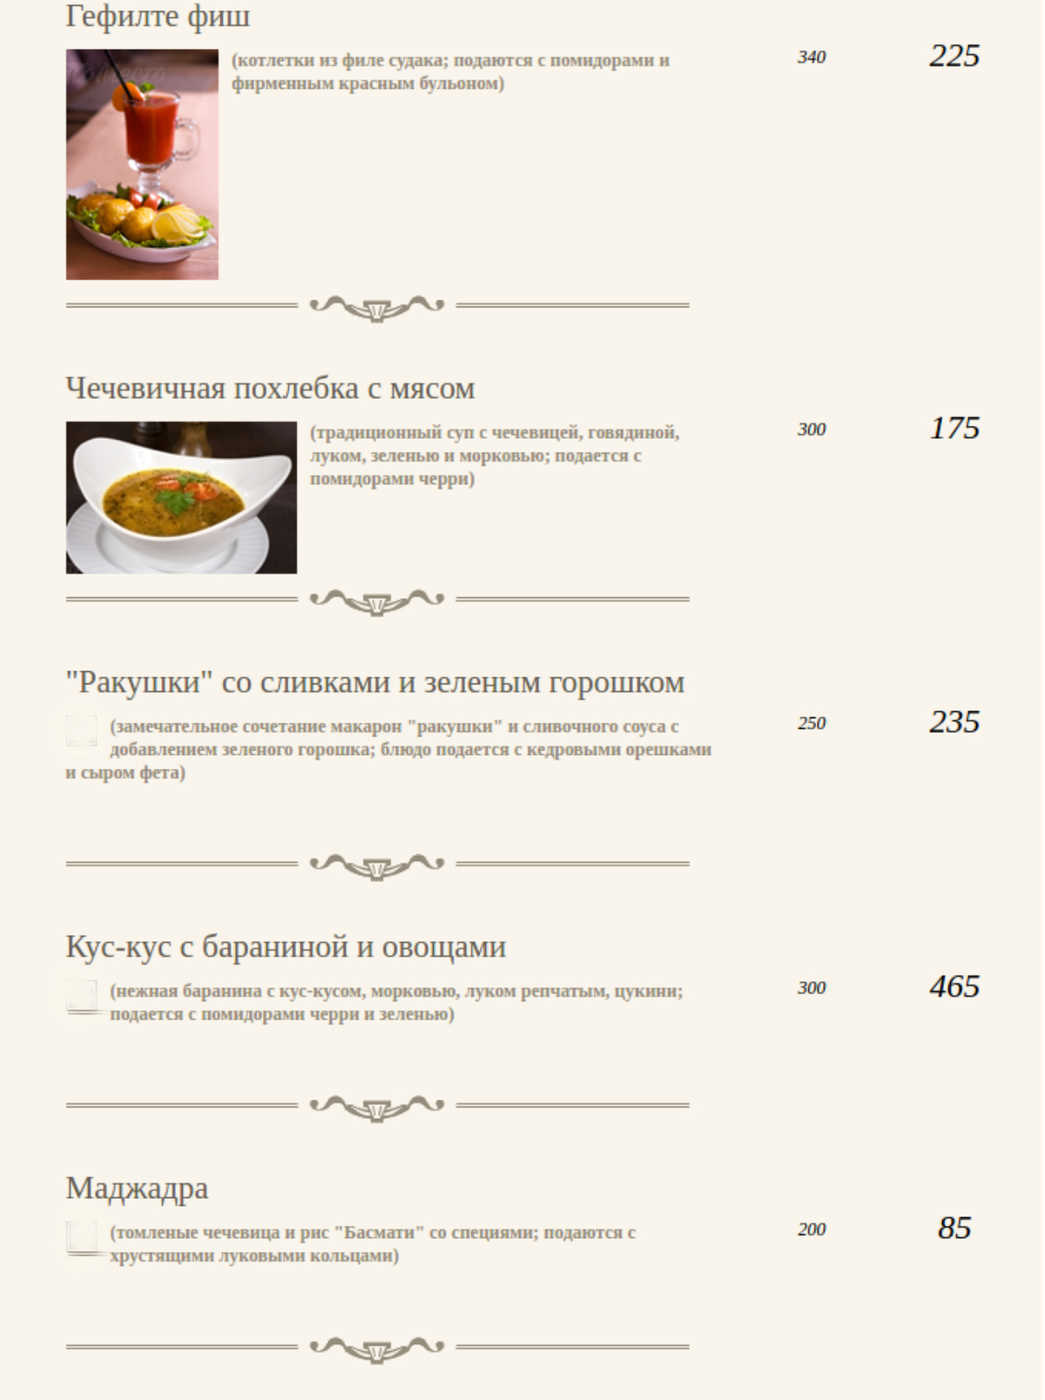 Меню кафе, ресторана Город N на улице Челюскинцев